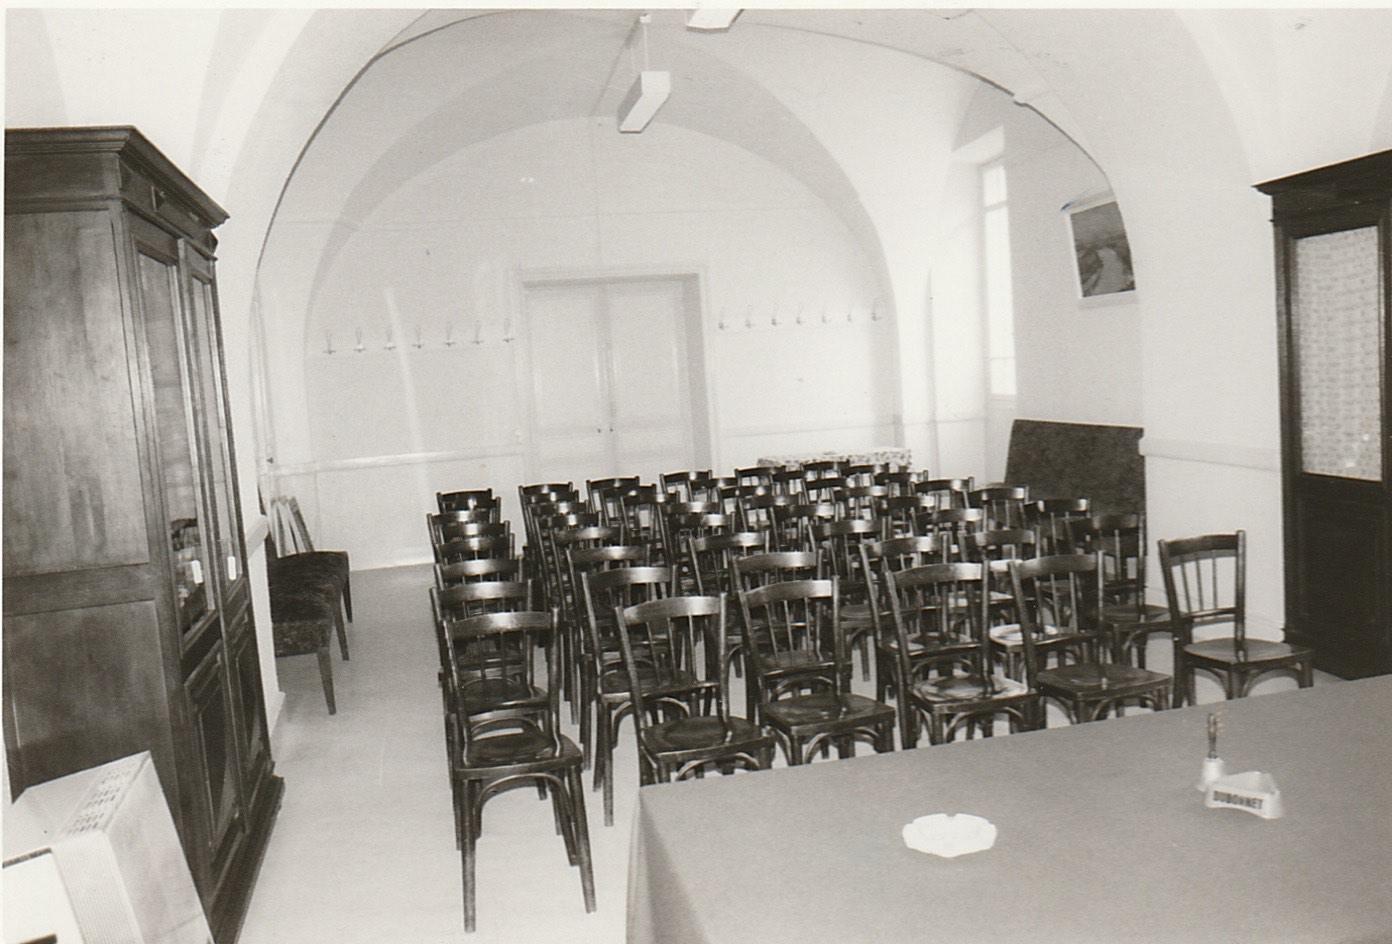 Salle peres 1938